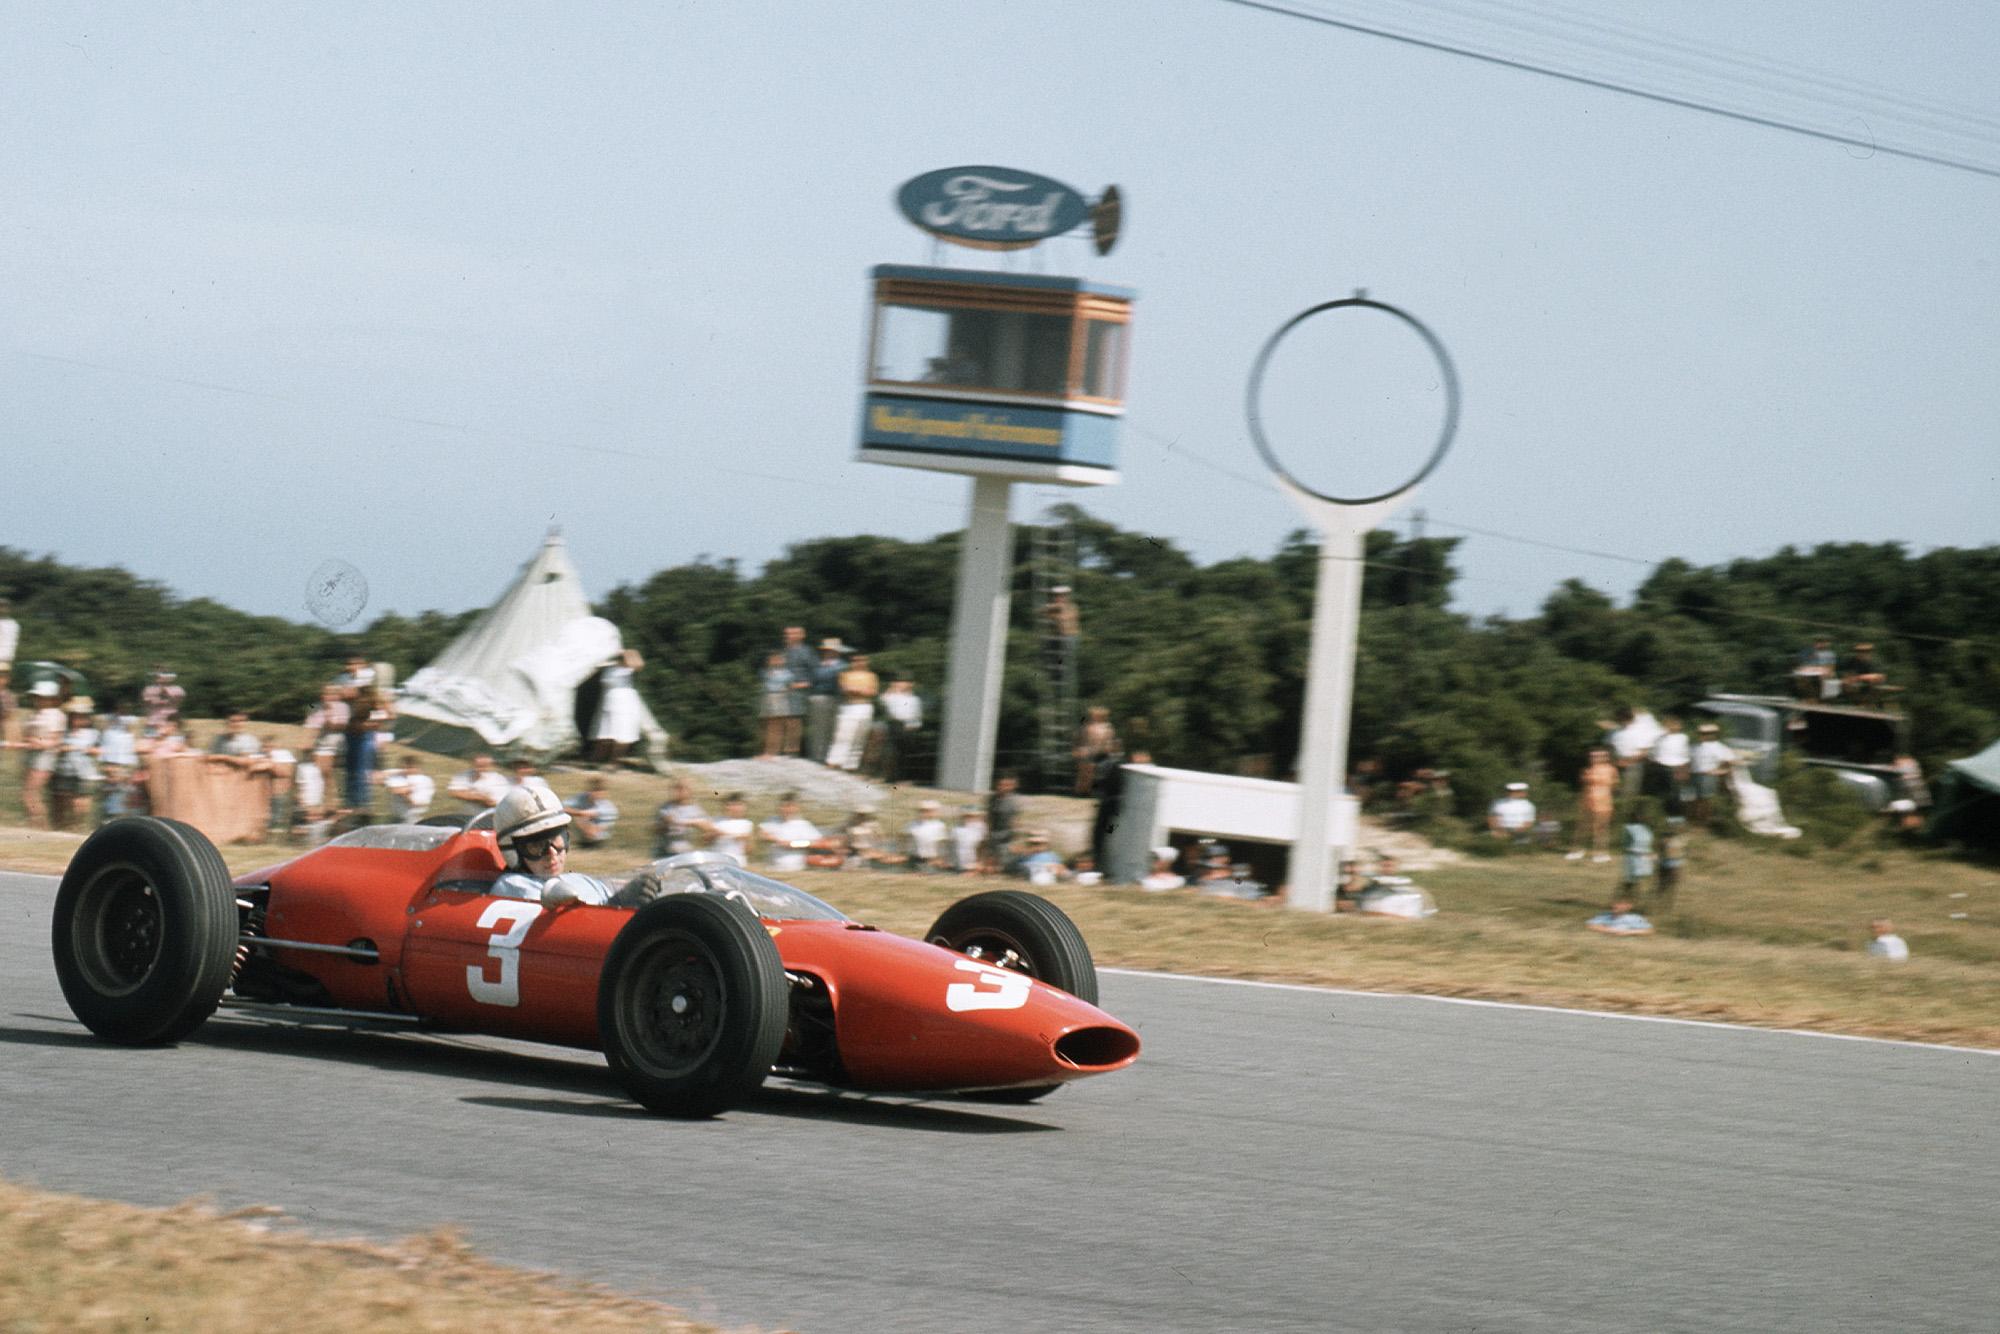 John Surtees (Ferrari Dino 156).